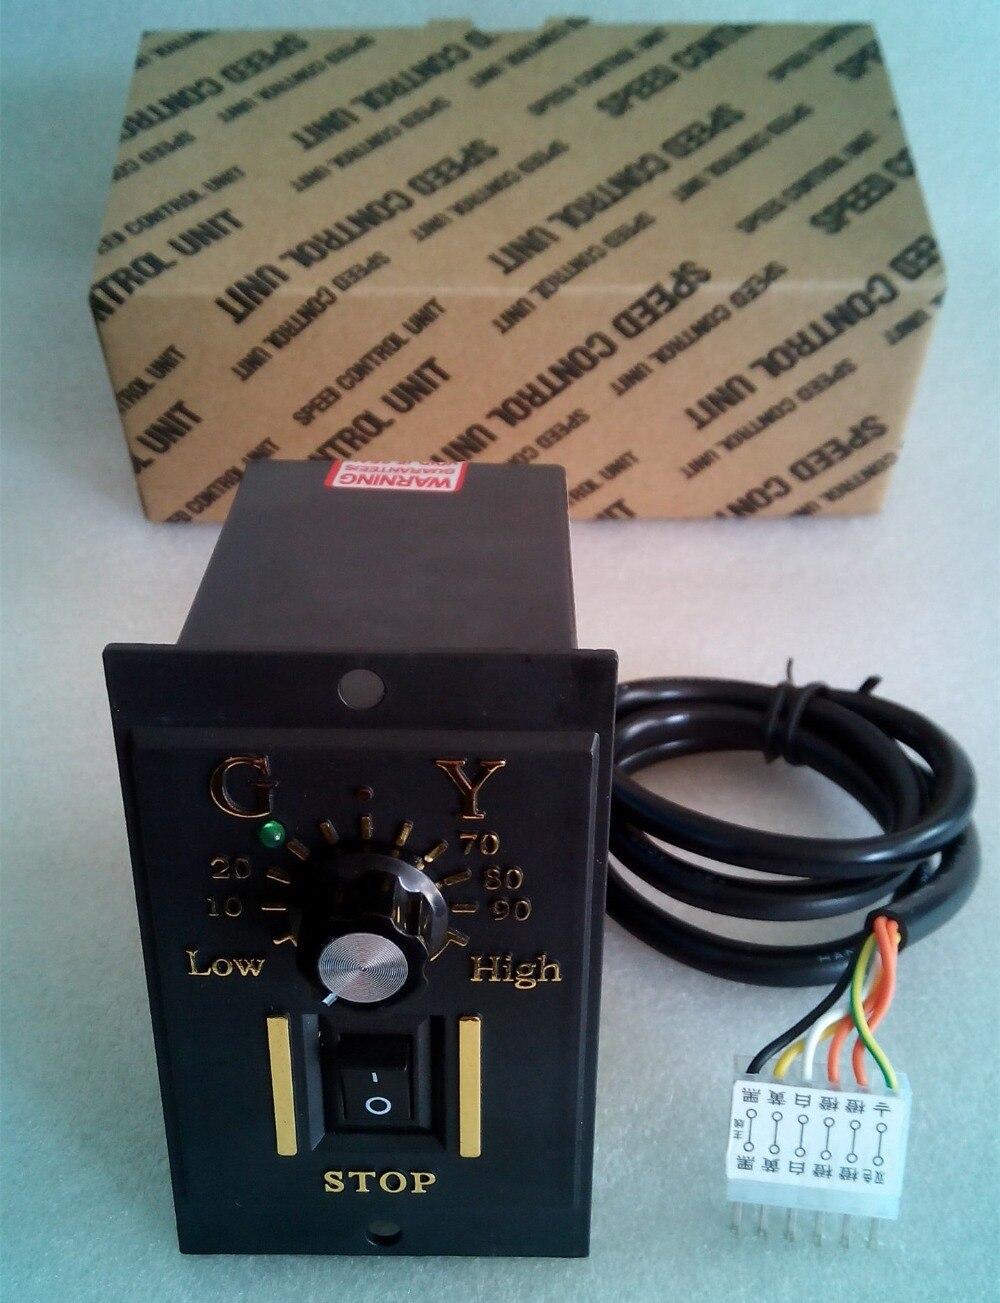 60 Watt AC 220 V motor drehzahlregler, vorwort & backword controller, AC geregelte geschwindigkeit motorsteuerung